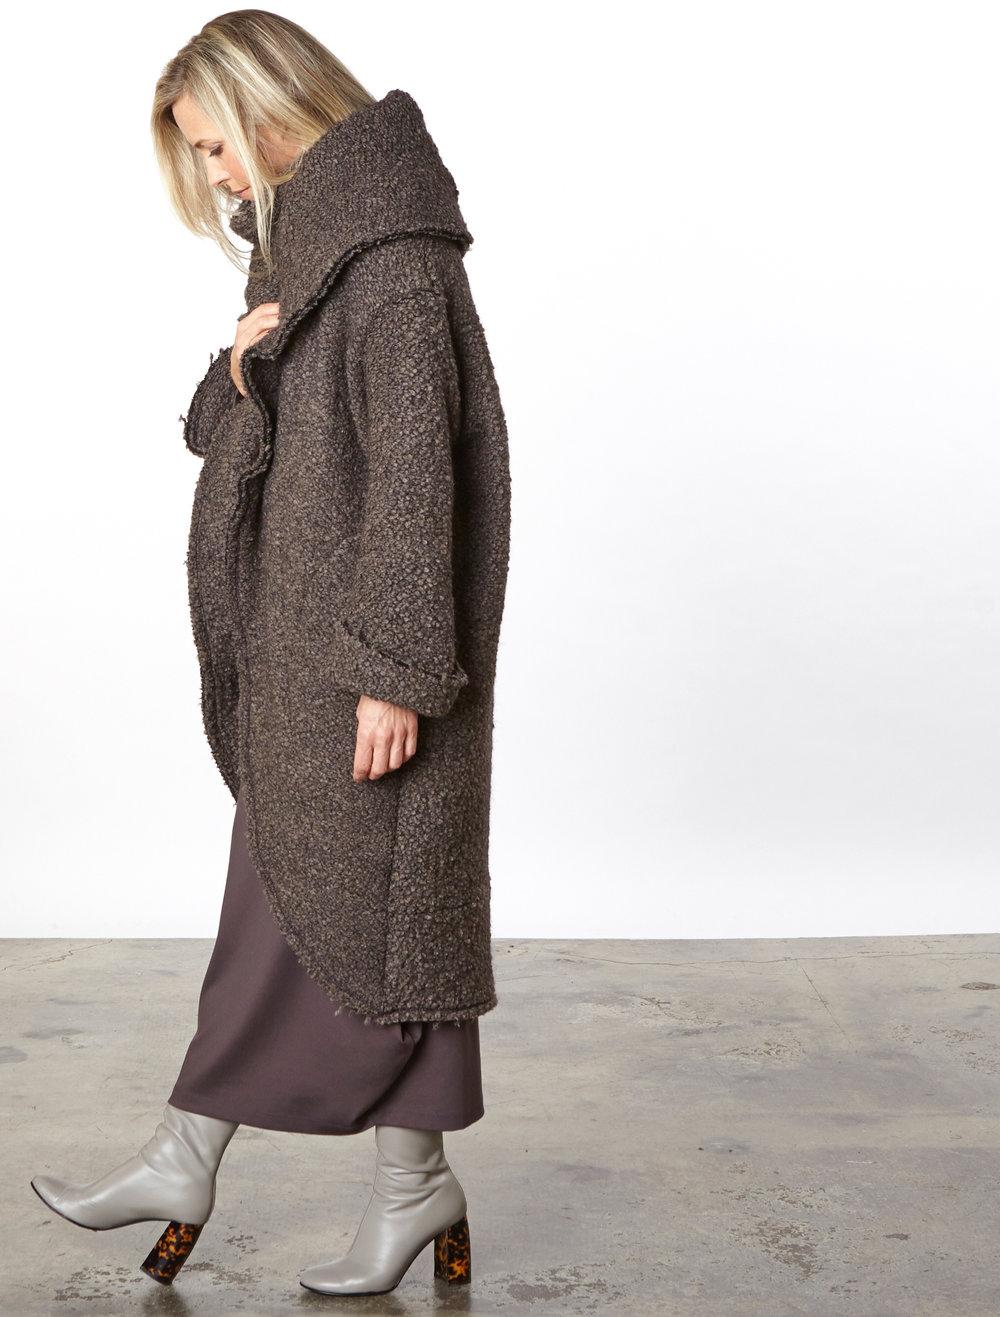 Wrap Coat in Orso Italian Boucle,Ilse Dress in Mocha Modal Ponti